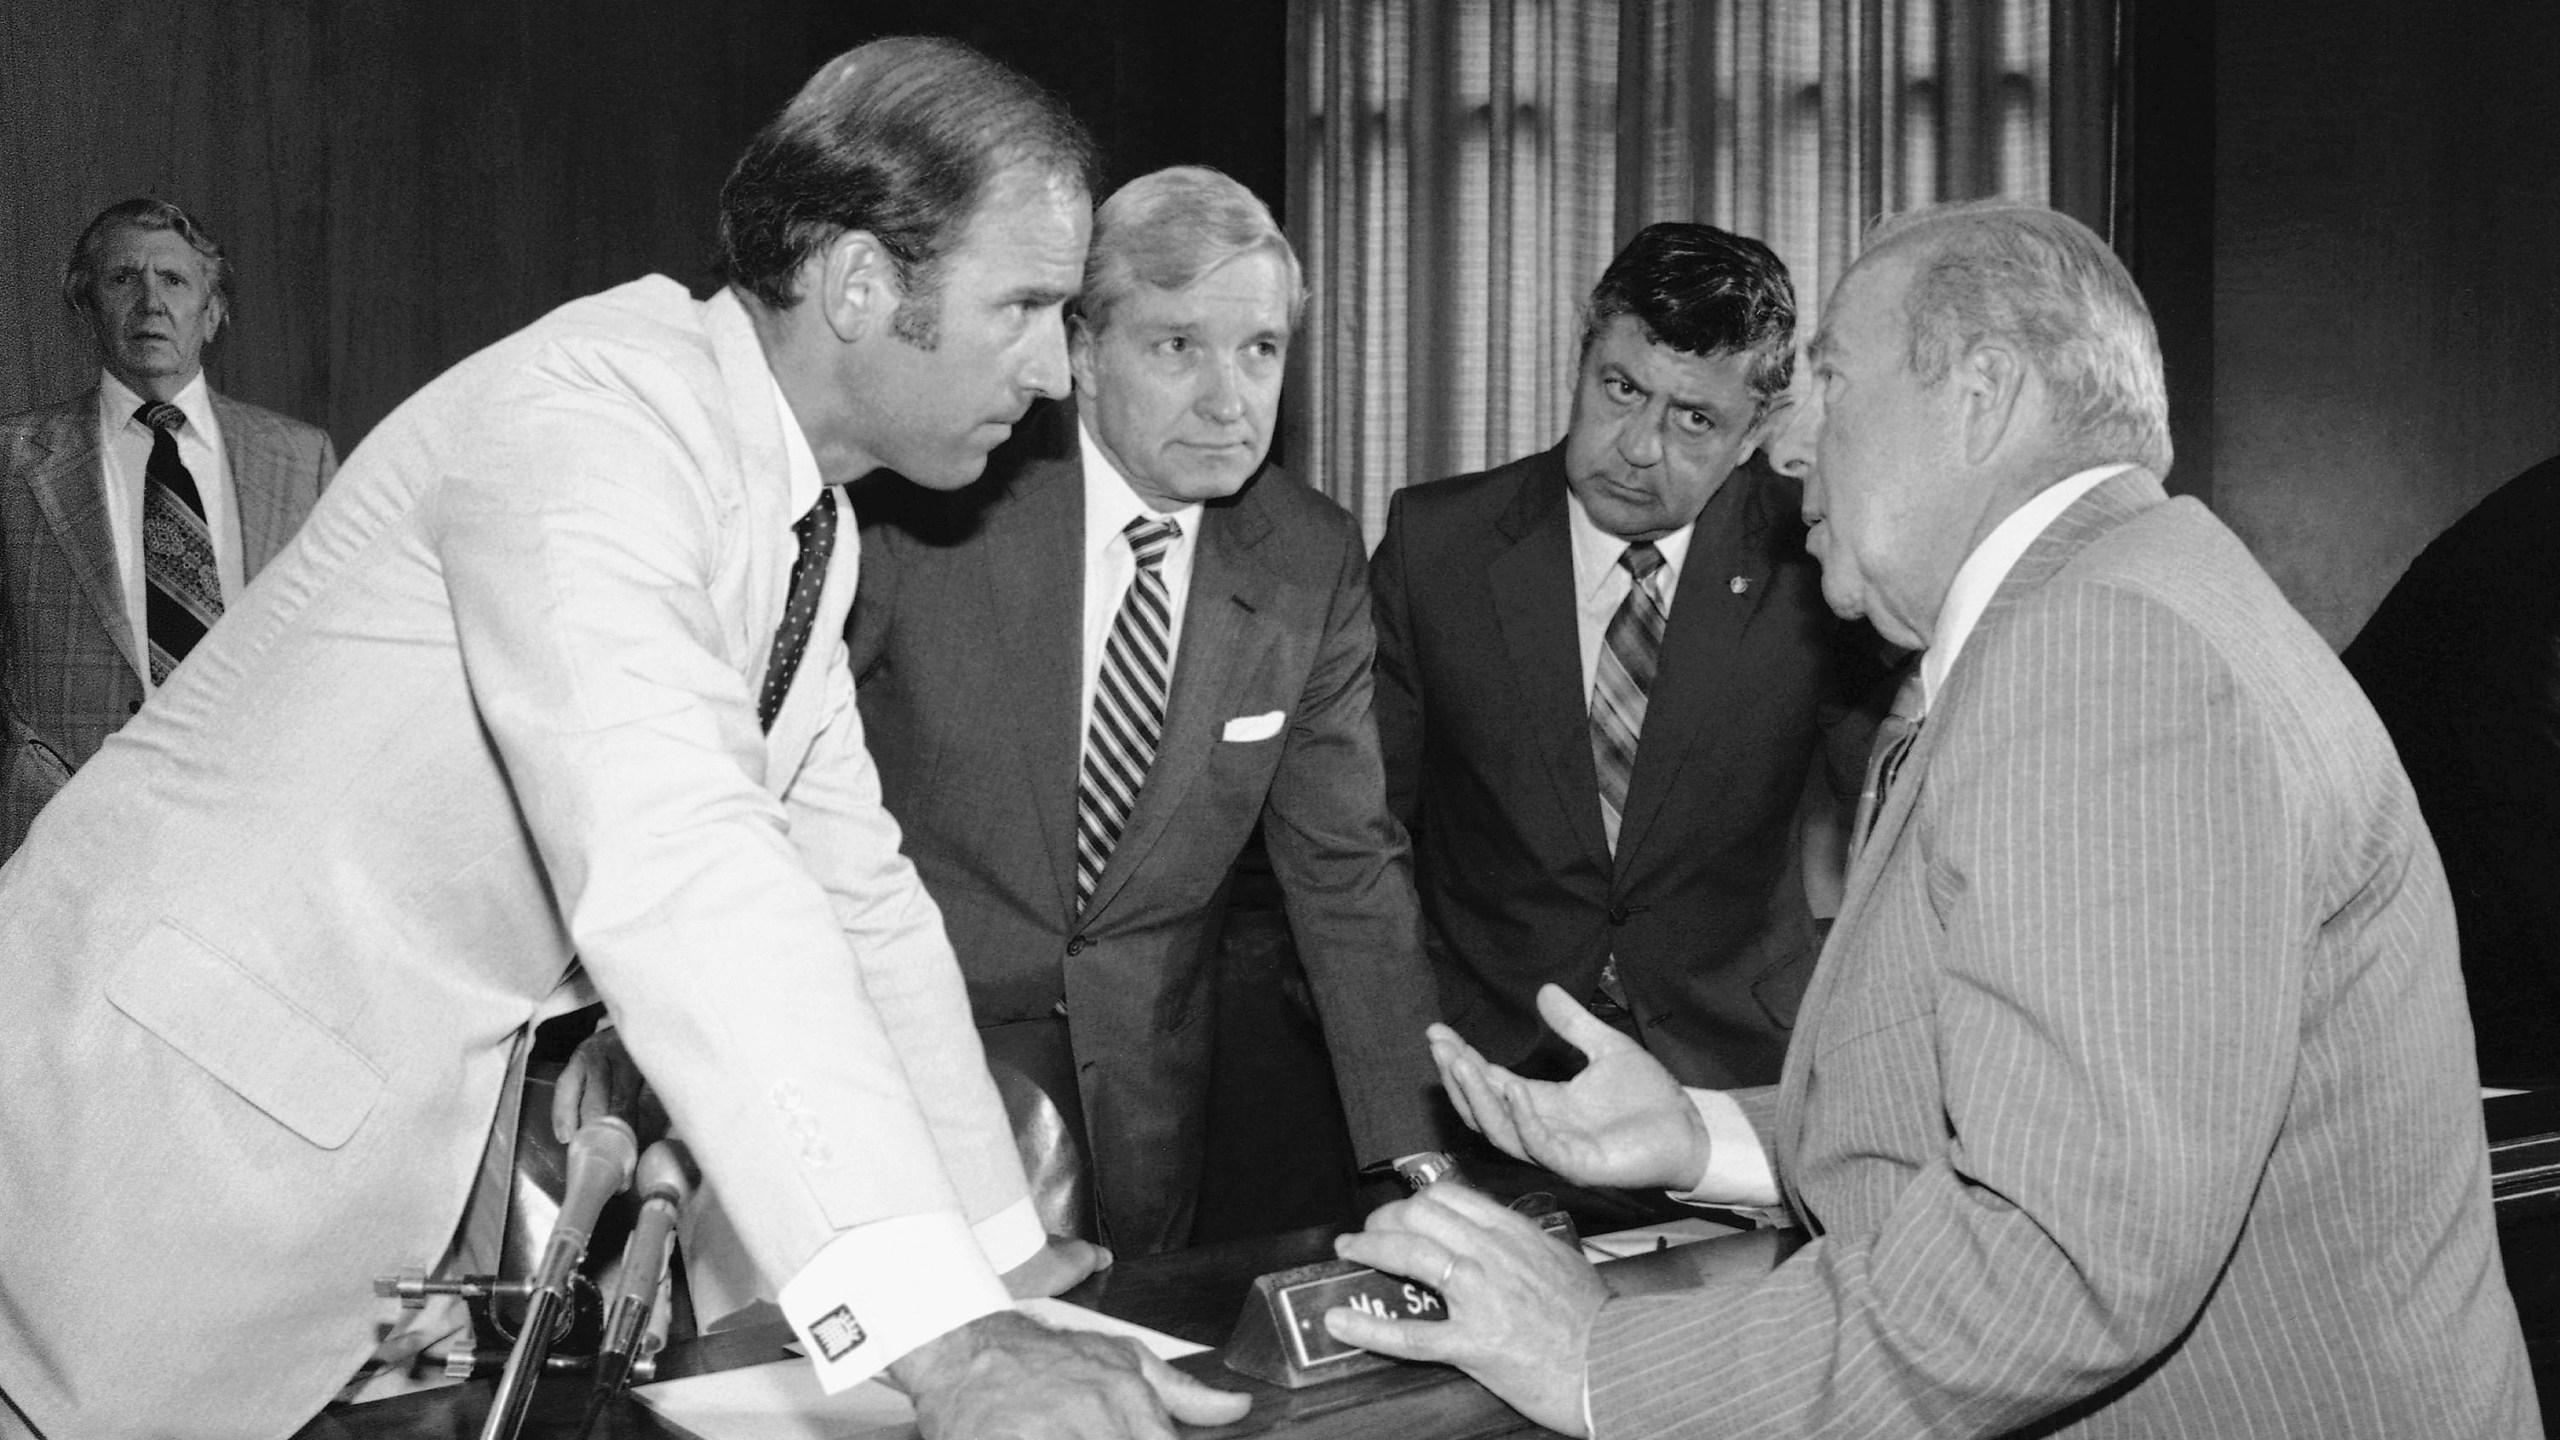 Joseph Biden, George Shultz, Charles Percy III, Edward Zirinsky